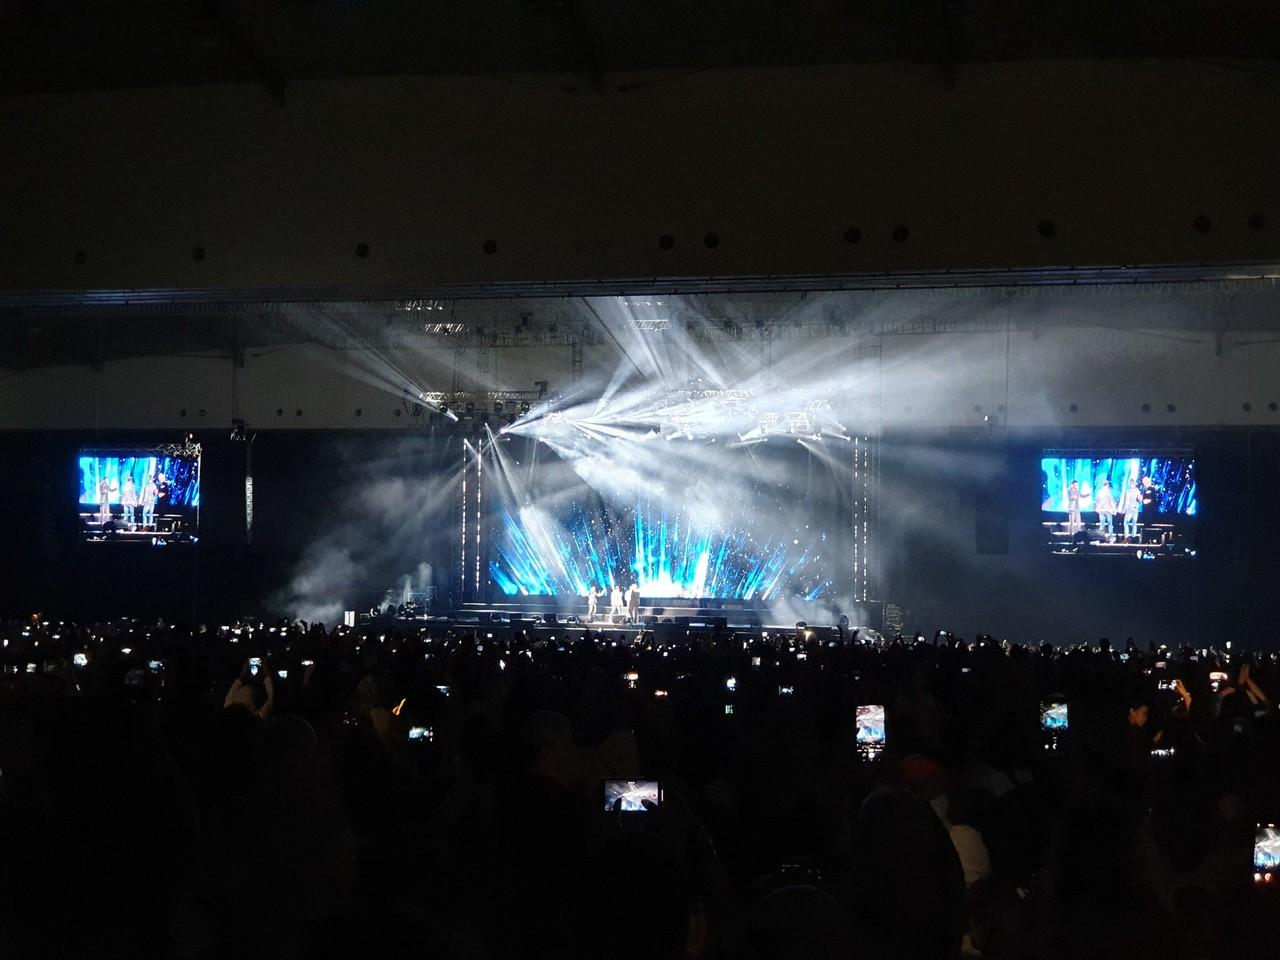 Menjejaki Jalan Kenangan Bareng Westlife di 'The Twenty Tour'